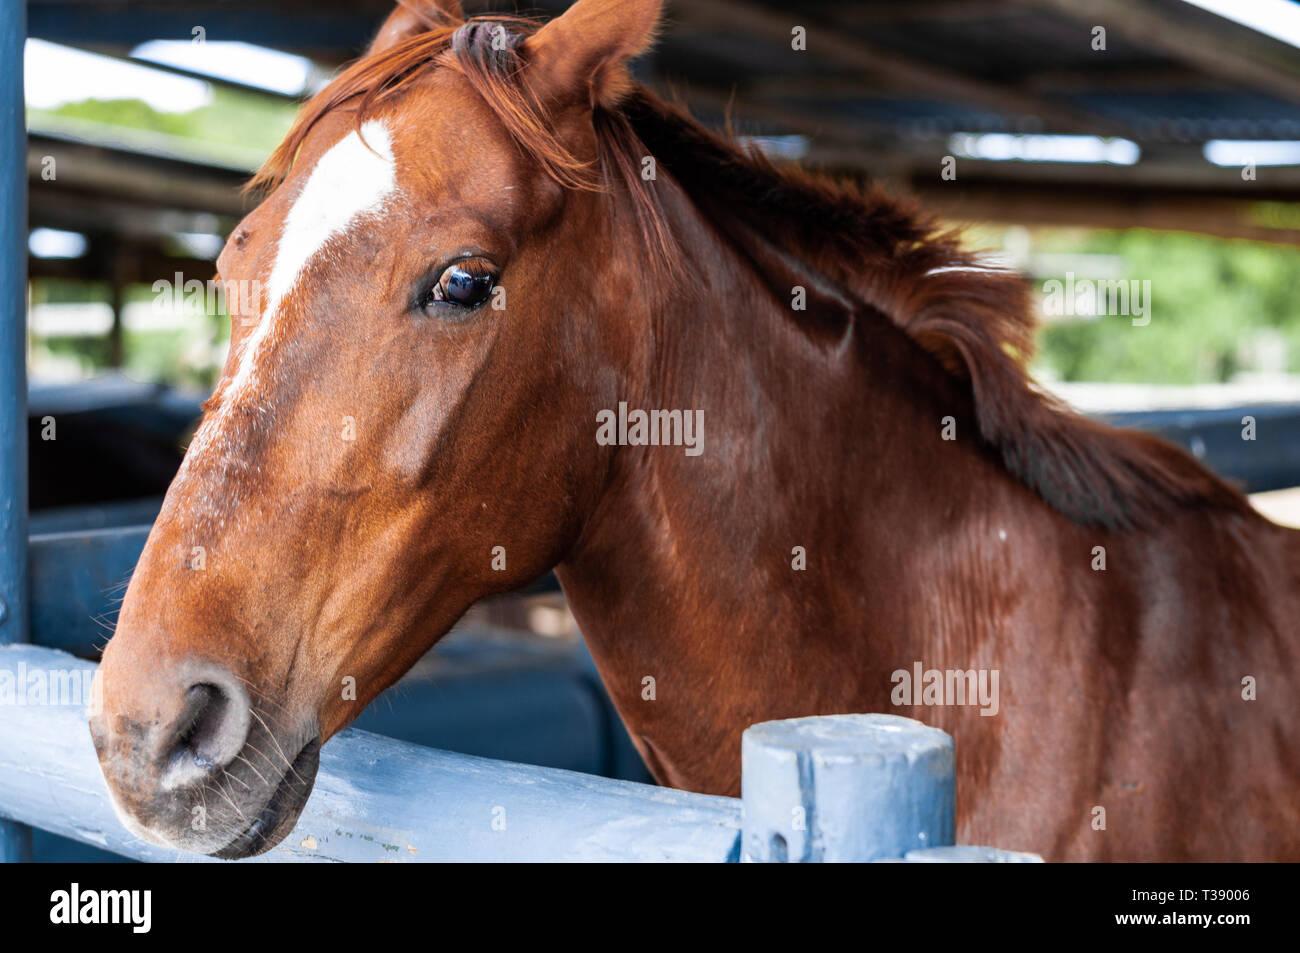 Portraits Other Photographs Of Horses Stock Photo Alamy